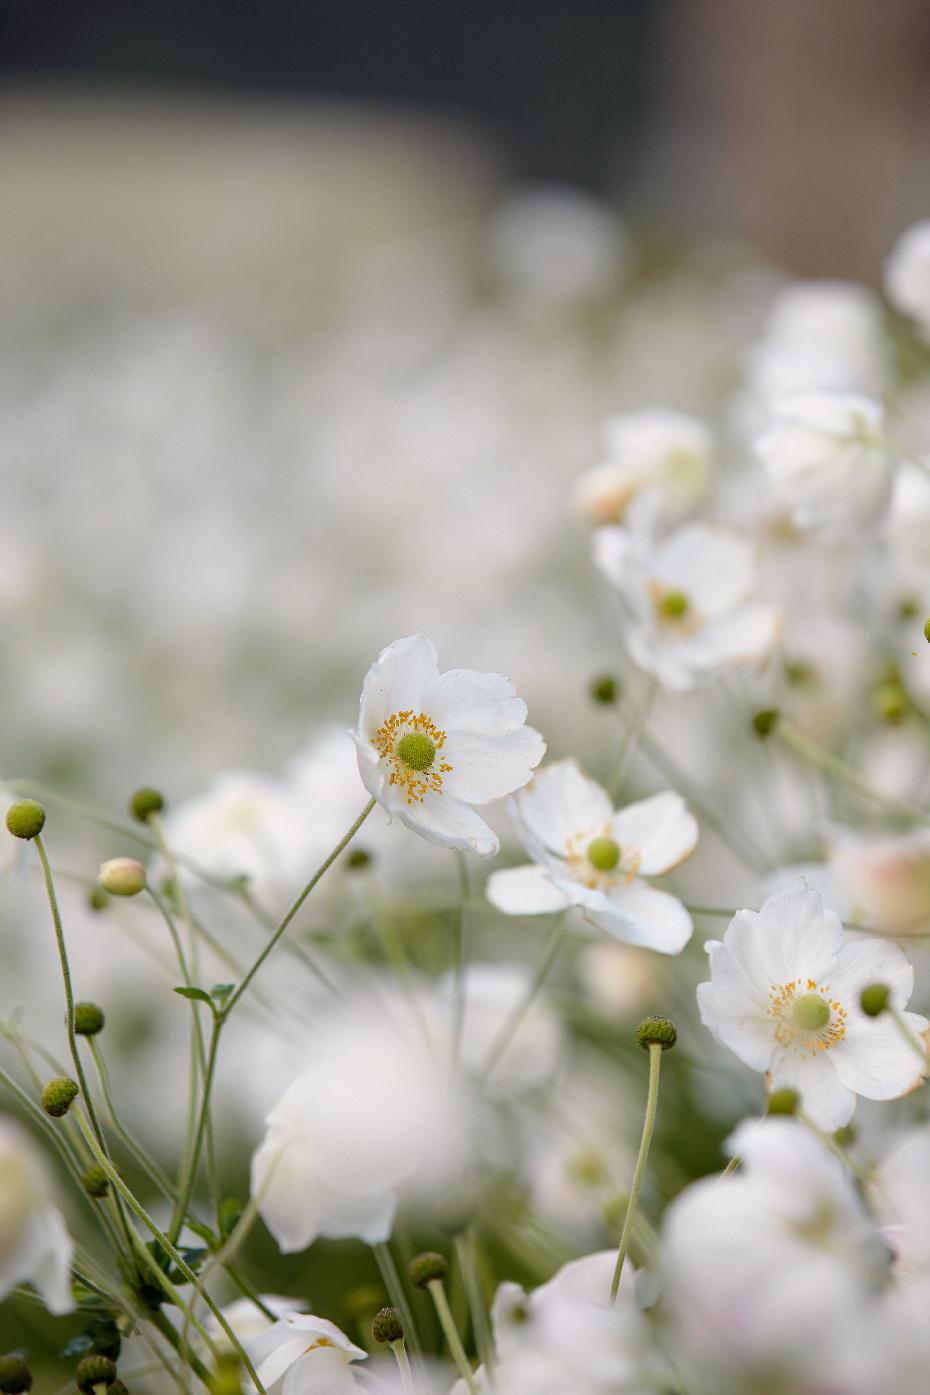 Stacey Van Berkel Photography I Pretty white flowers